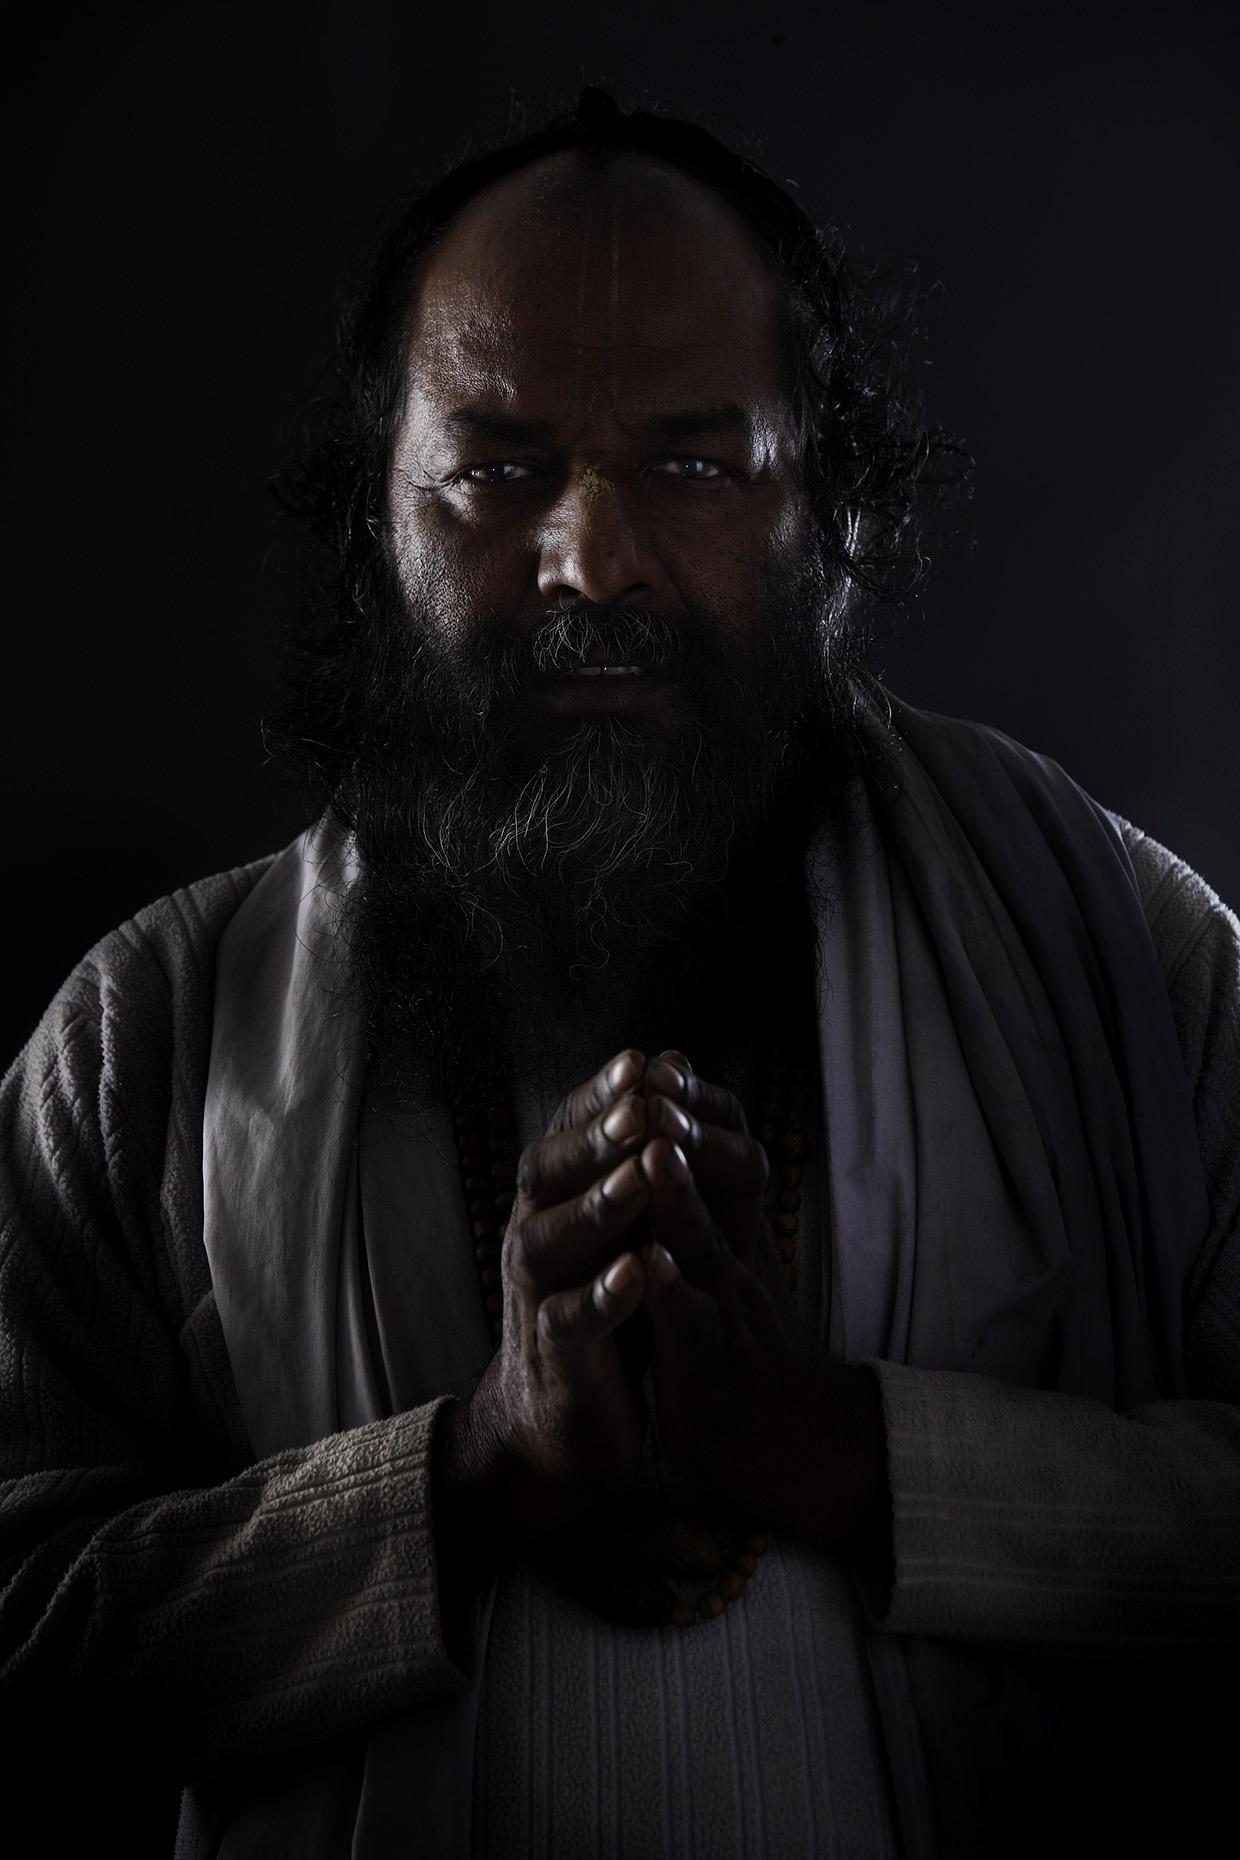 Dark Krishna posing in front of the camera at the Kumbh Mela